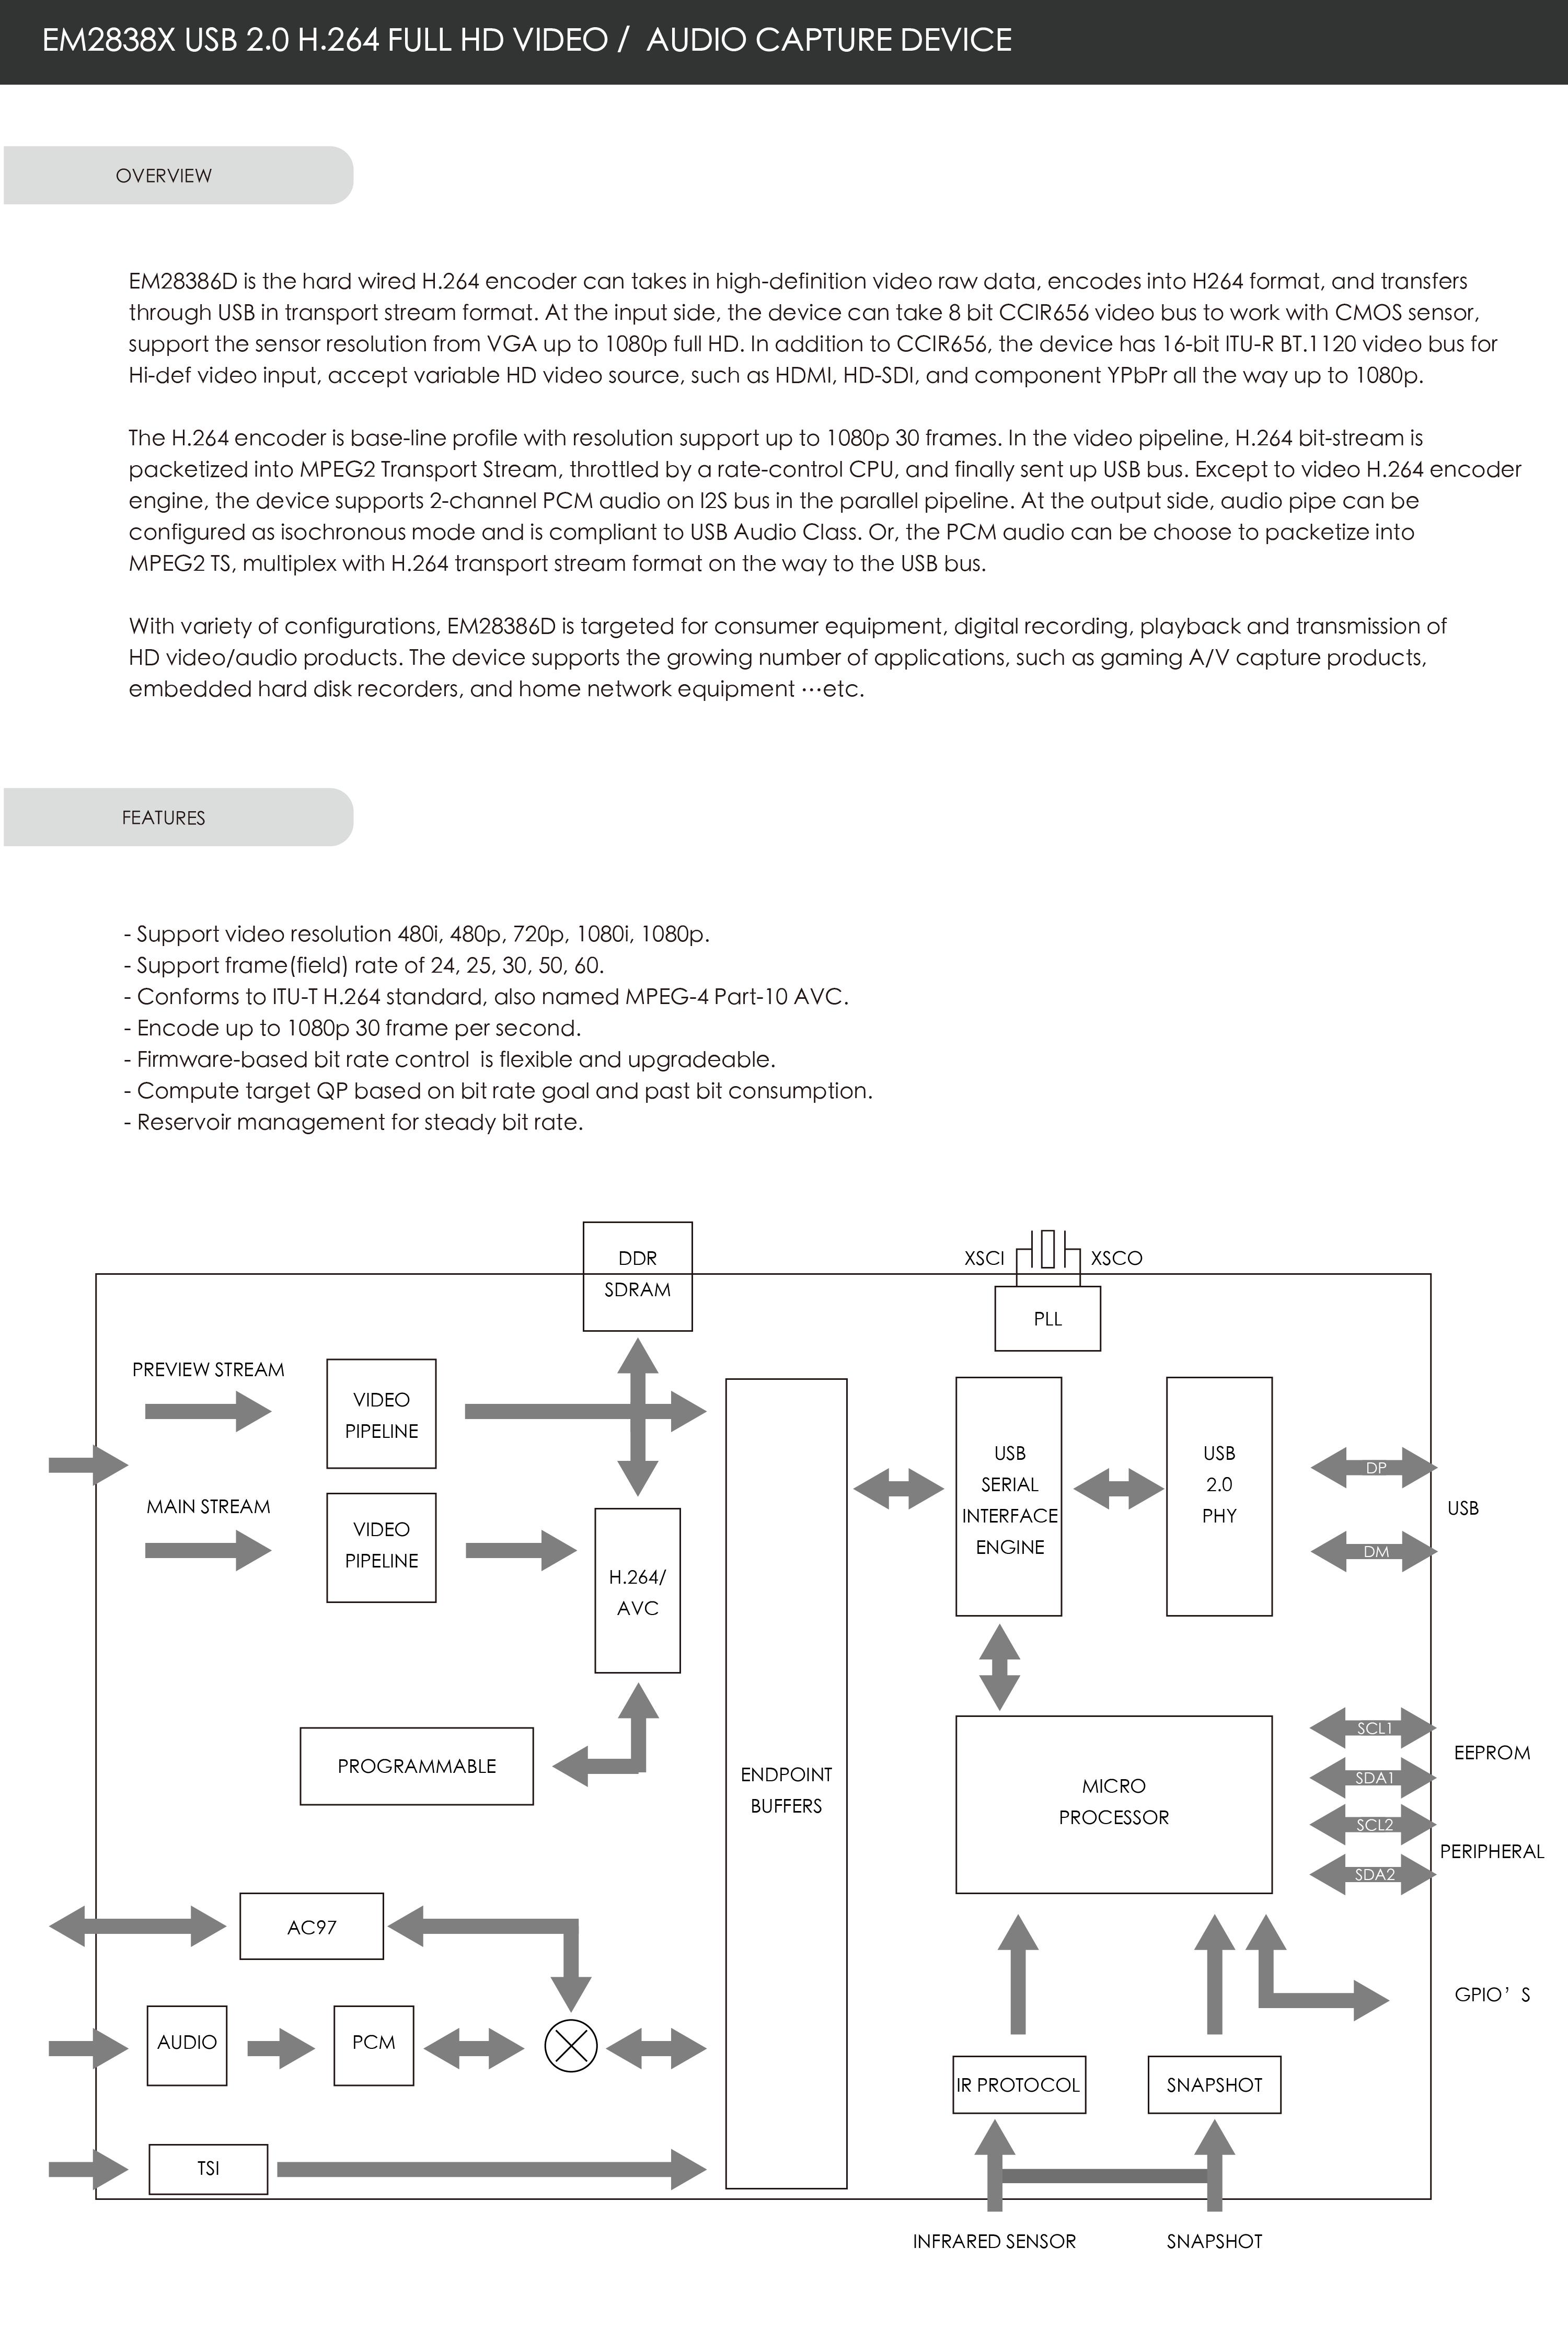 EM2838x-video-audio capture device